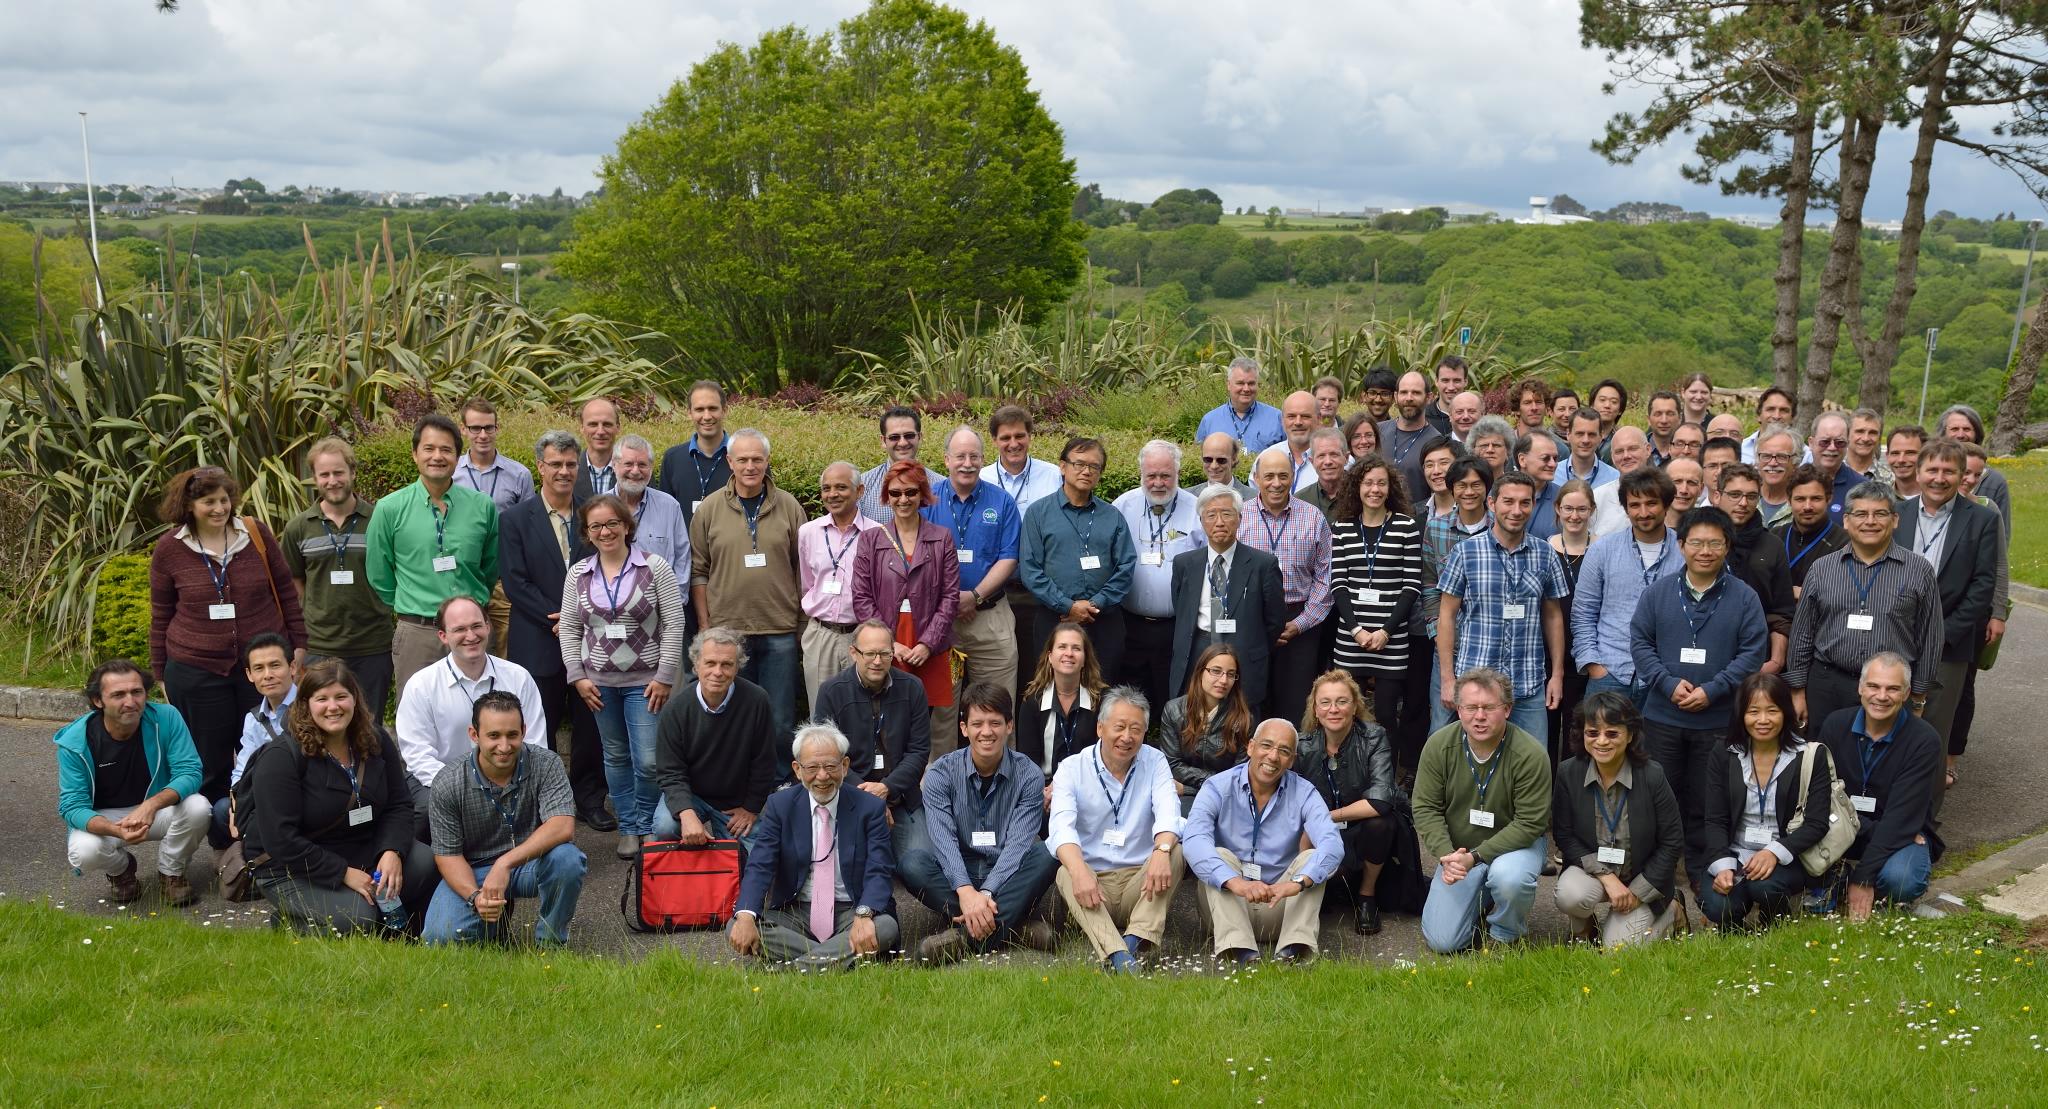 Scatterometry - NASA OVWST and International OVWST Meetings